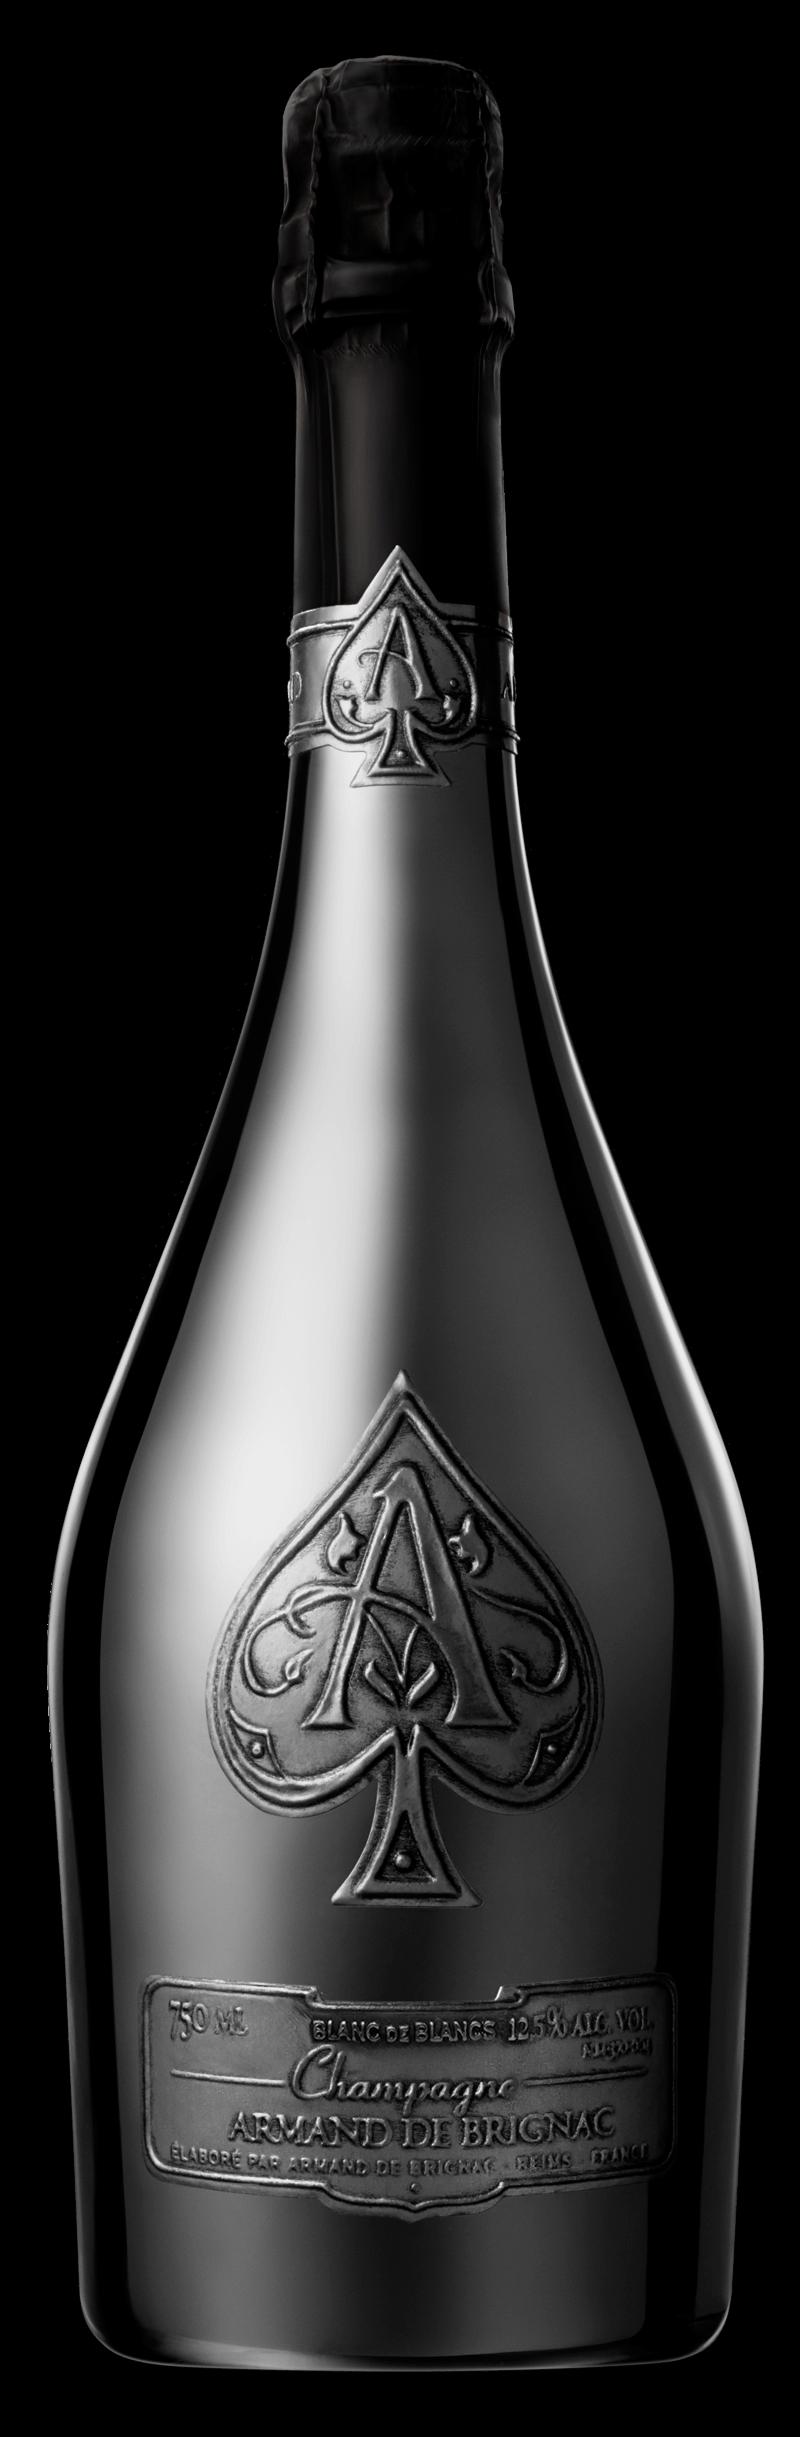 Blanc de Blancs - Armand de Brignac Champagne